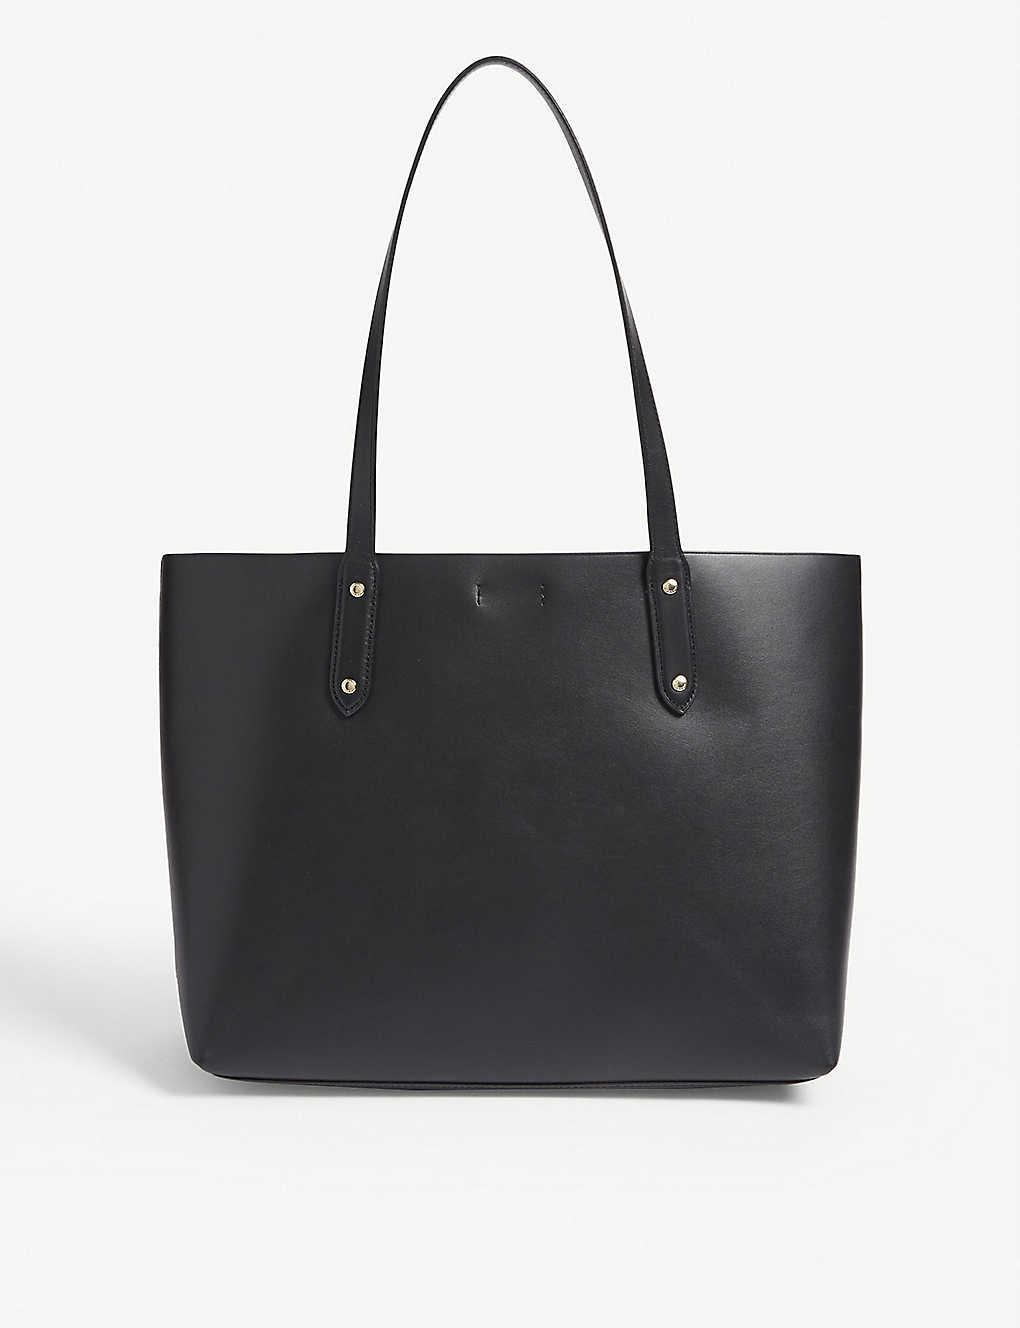 1cb4f0154 COACH - Market leather tote | Selfridges.com